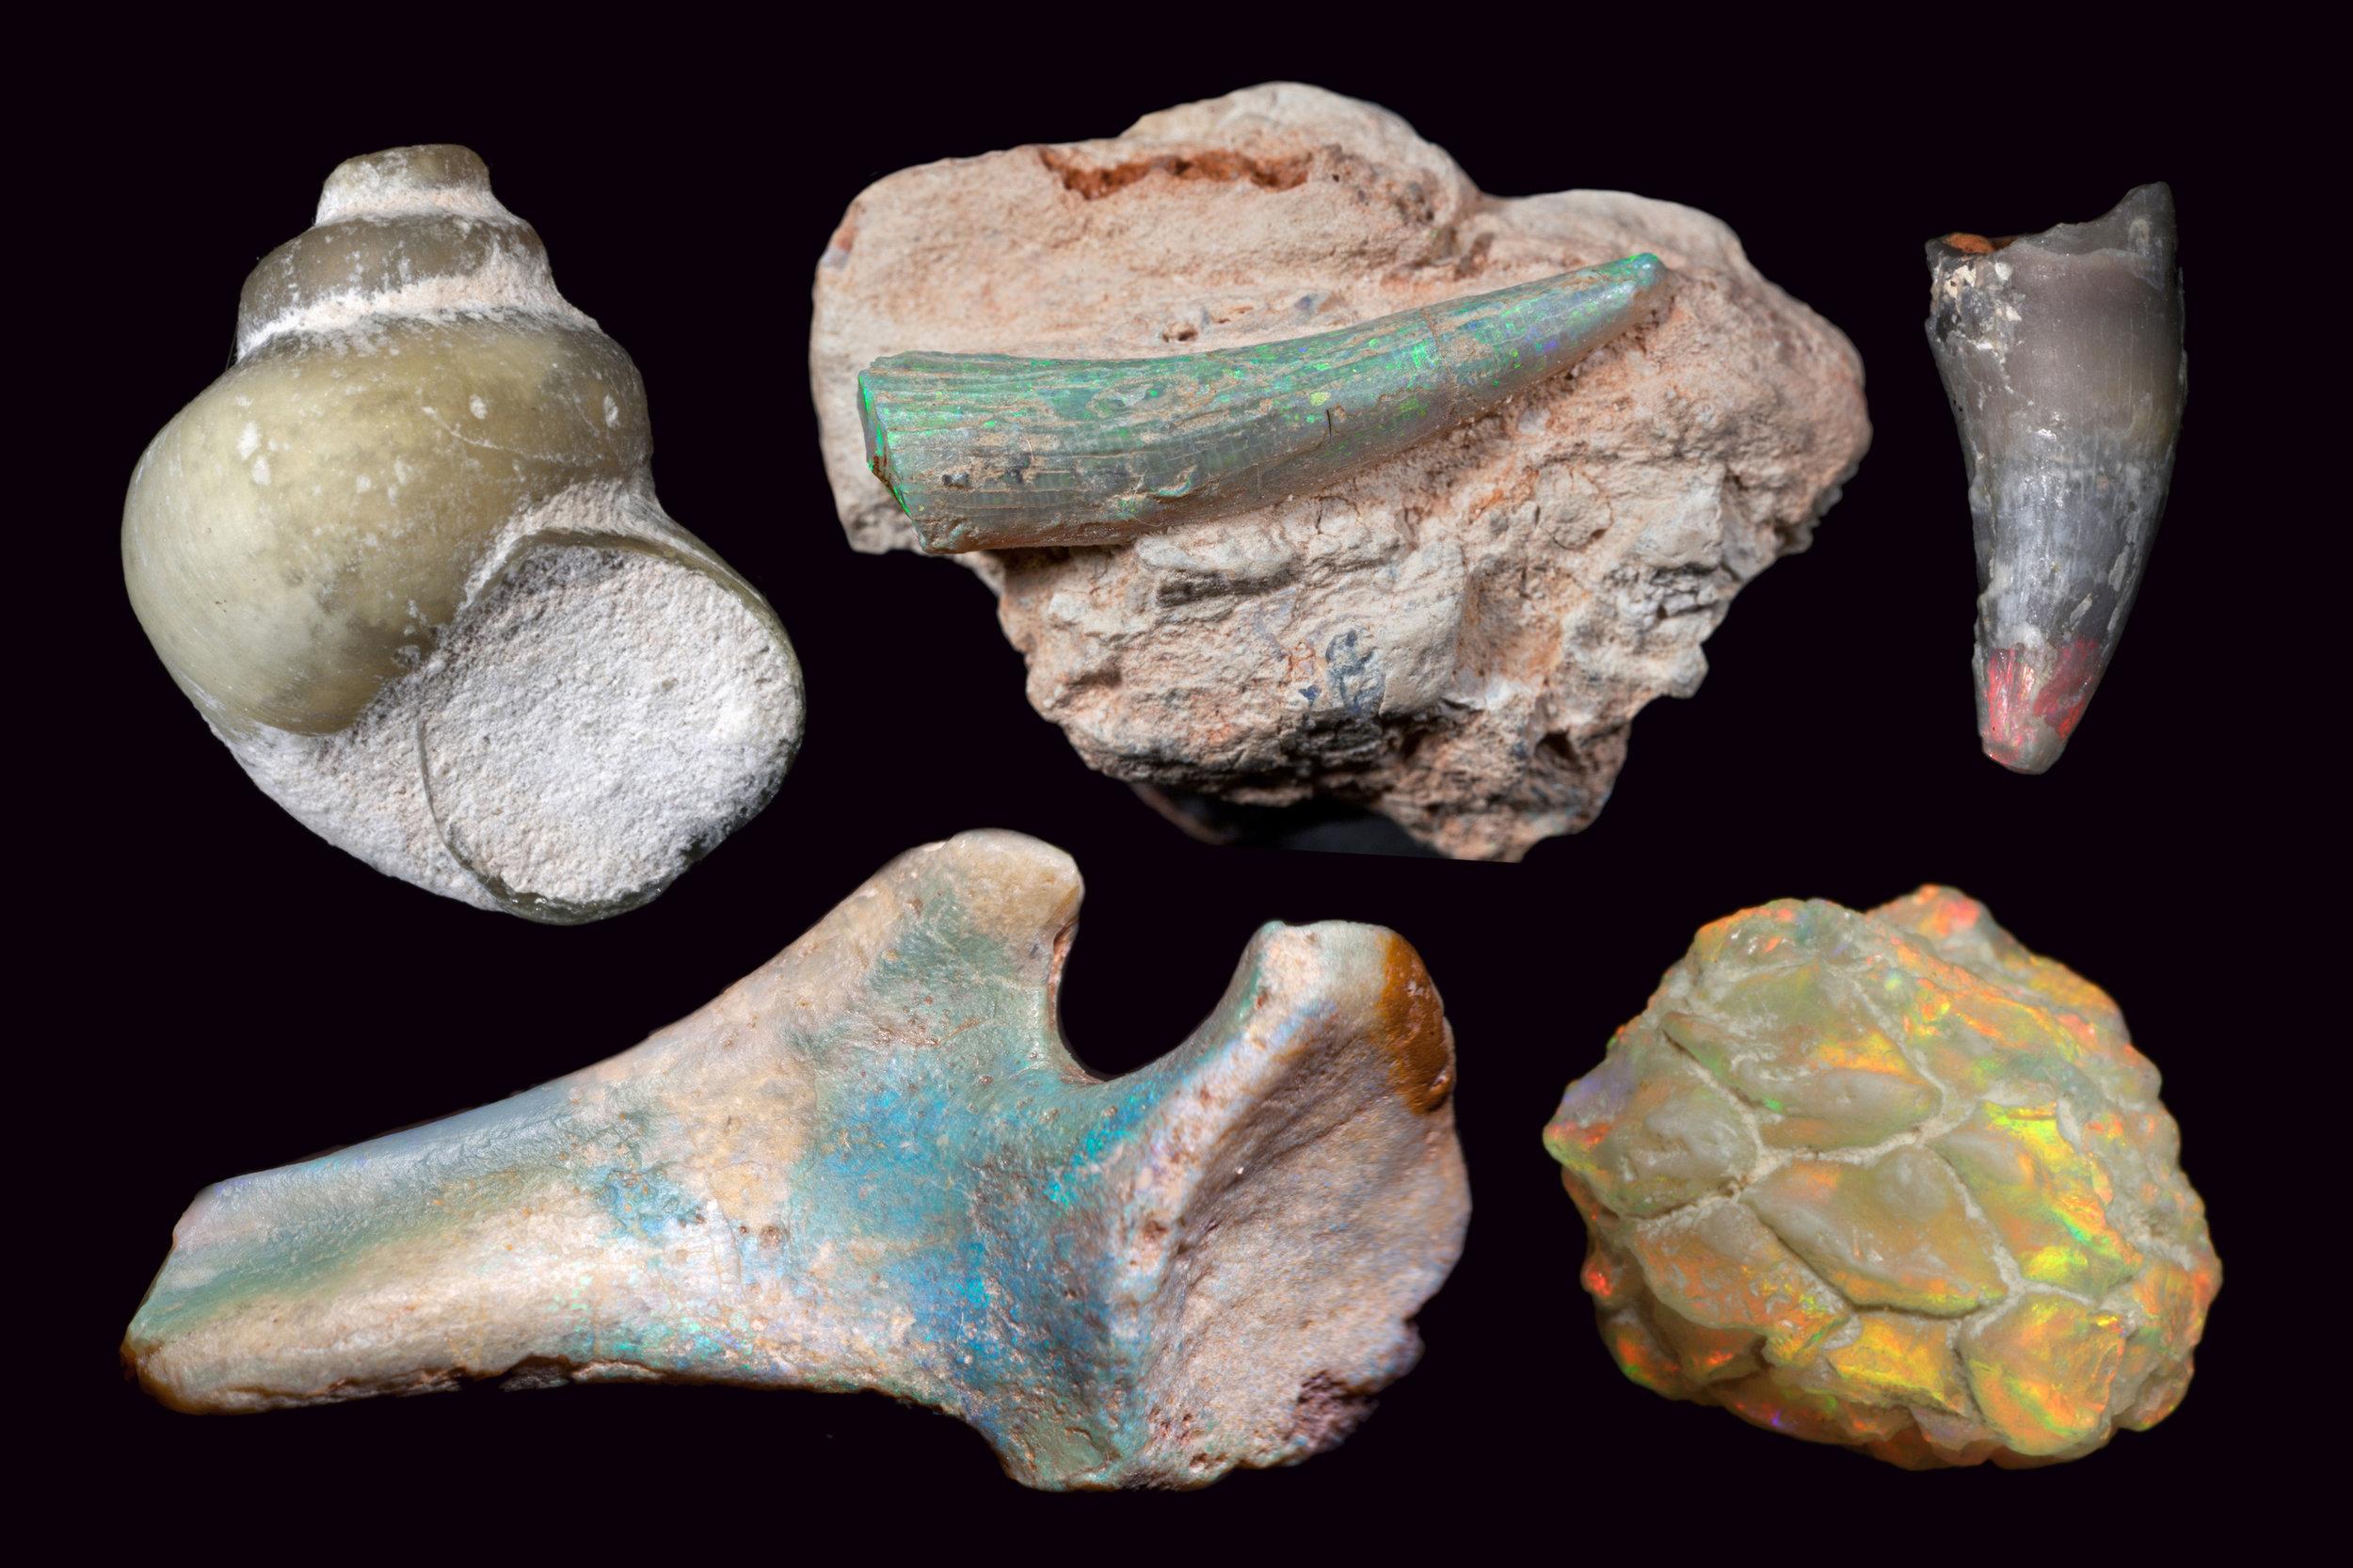 Chasing opal in the Australian Outback, Undark (Image: Robert A. Smith/Jenni Brammall, Australian Opal Centre)